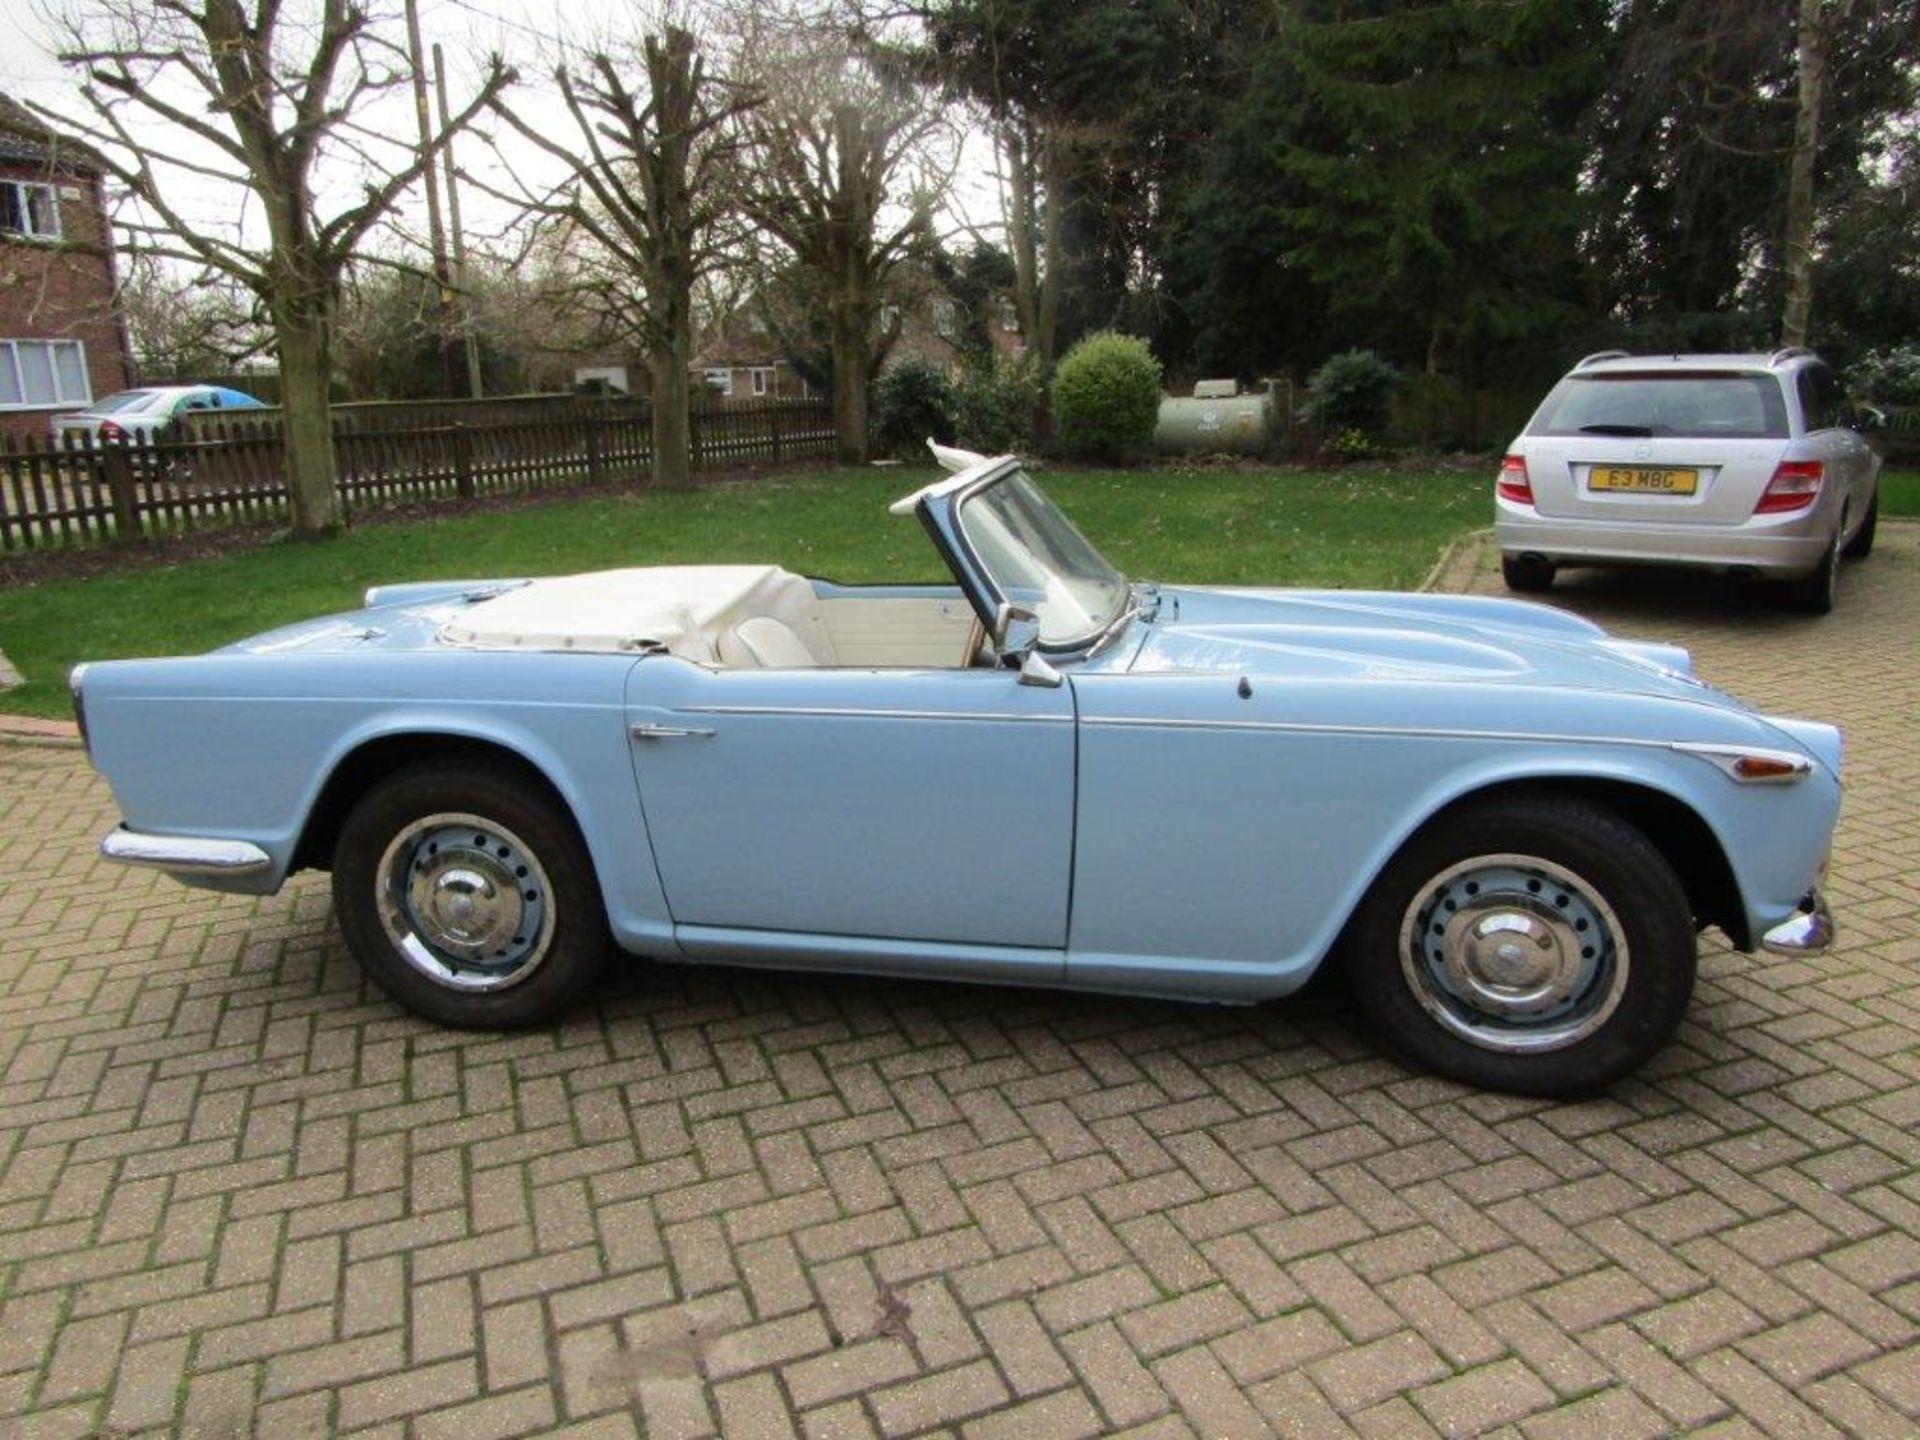 1965 Triumph TR4 - Image 9 of 17